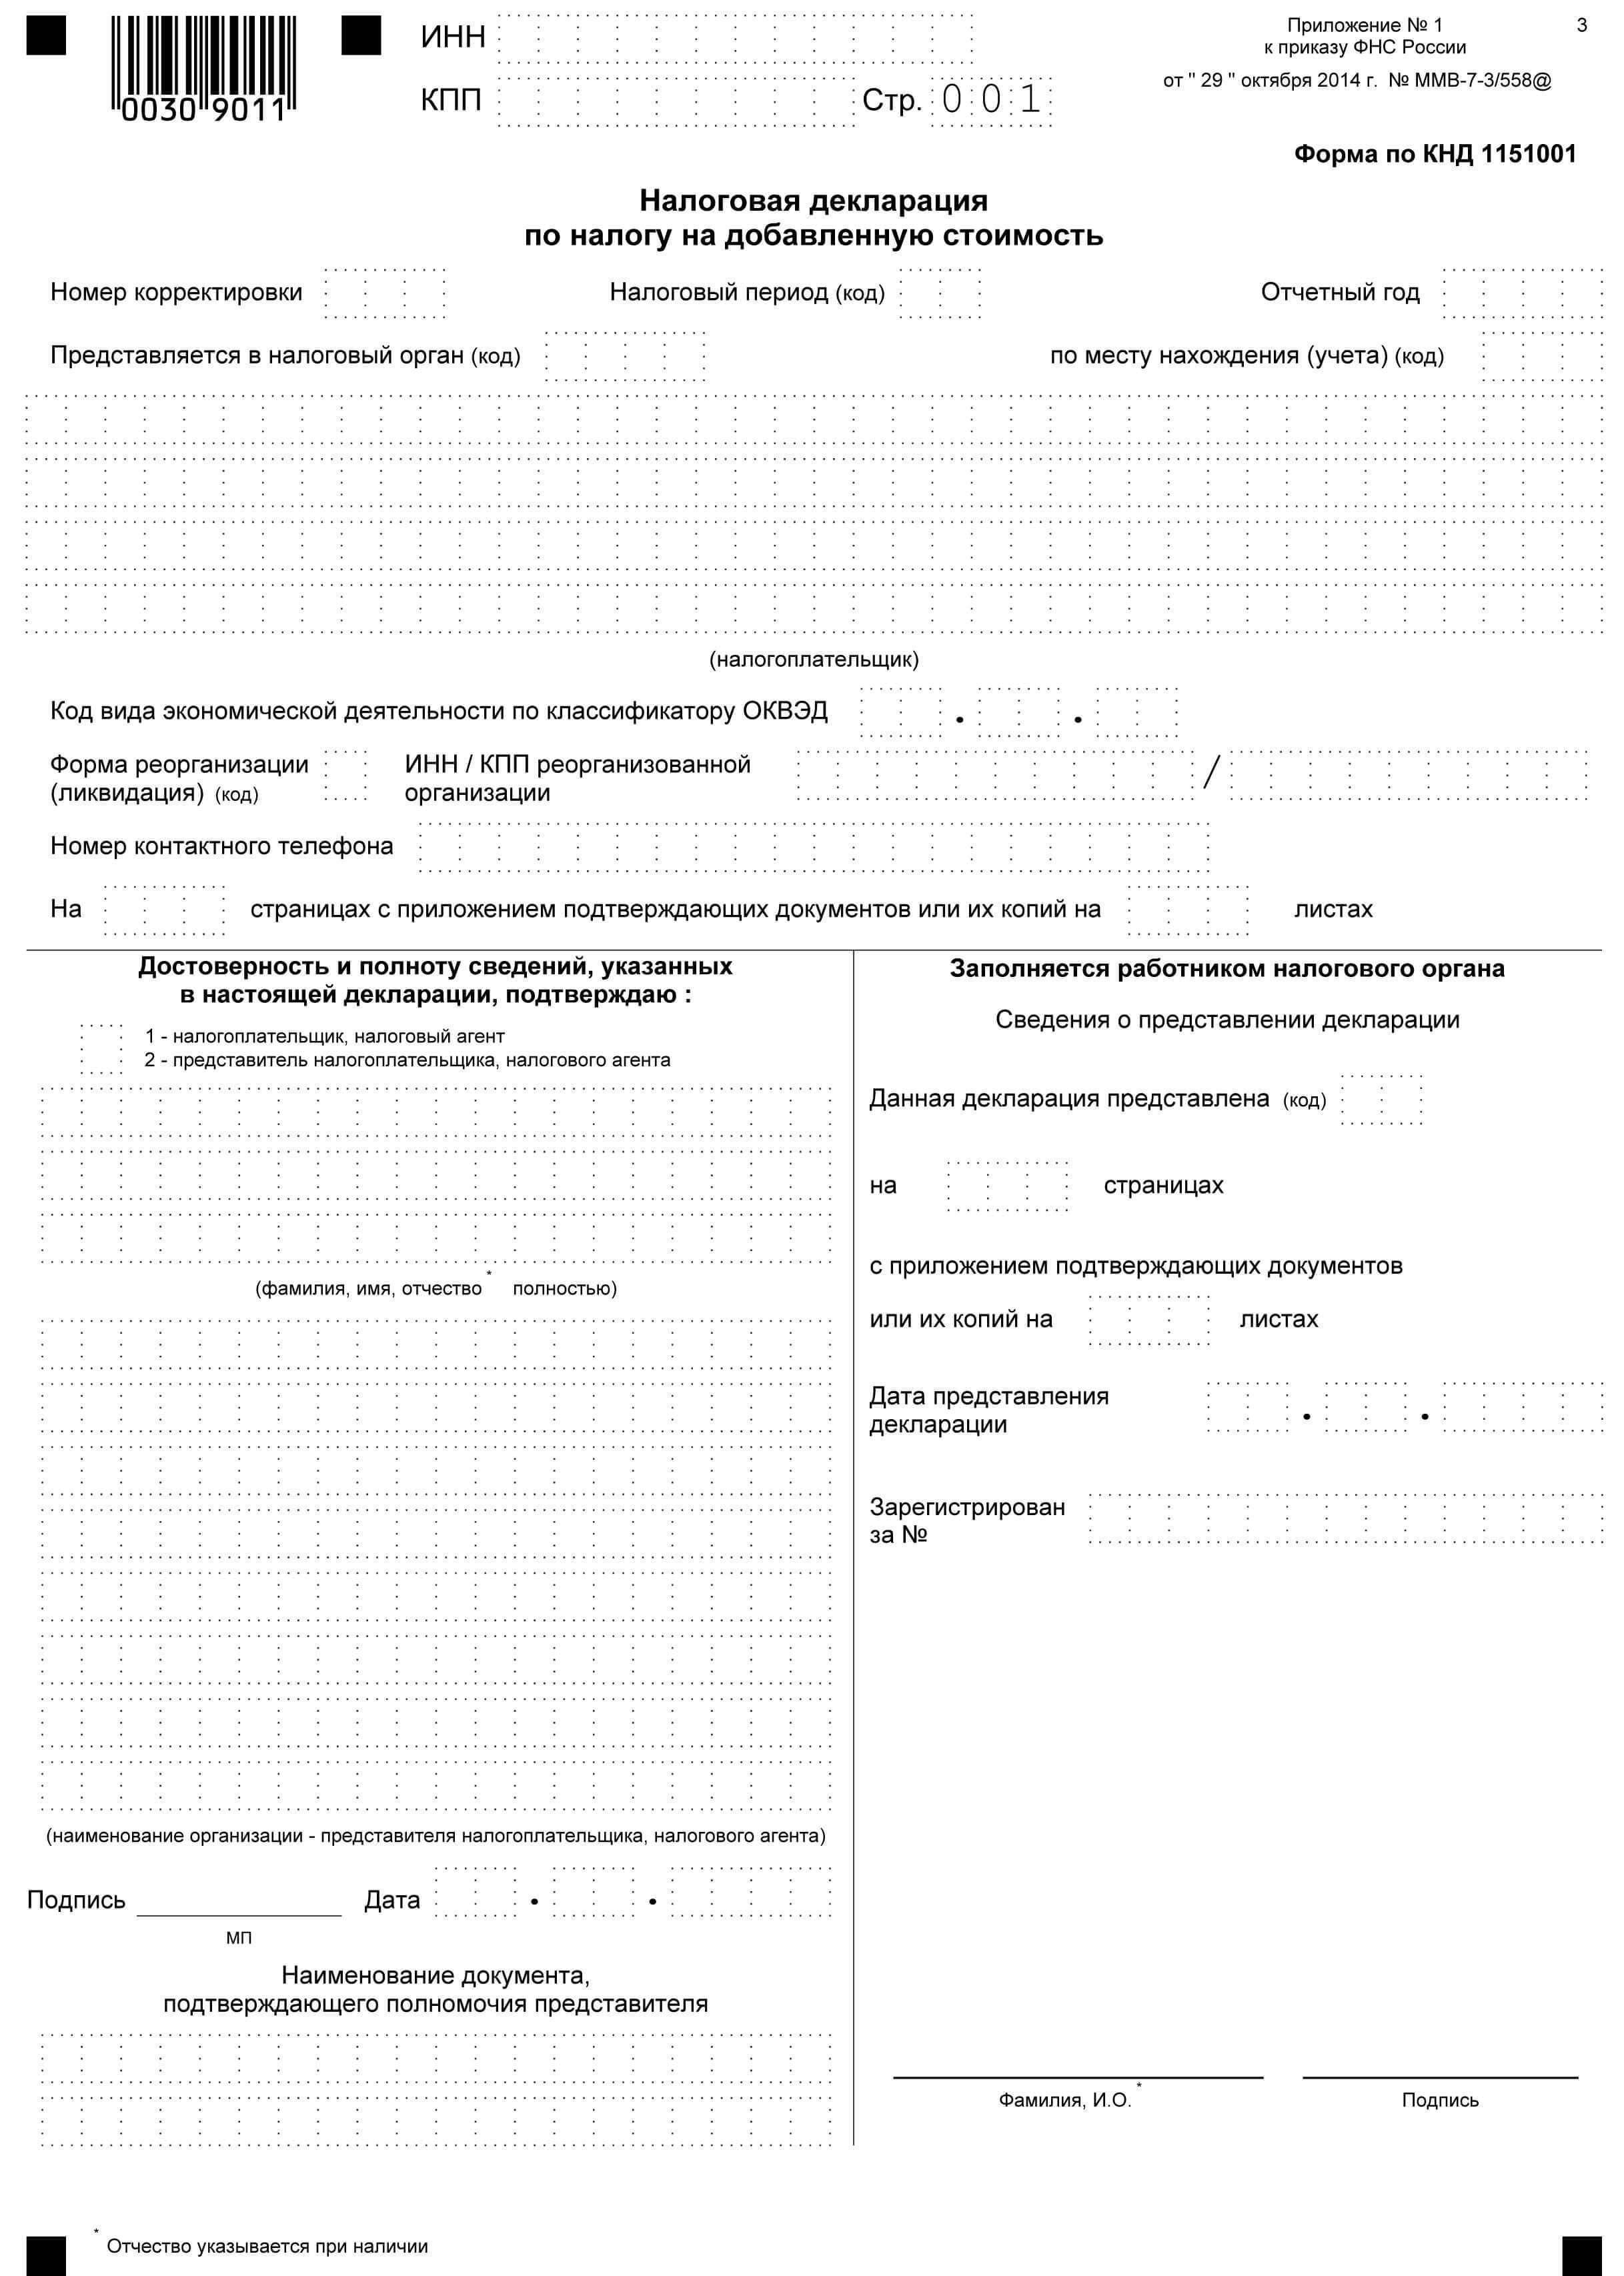 бланк декларации по усн за 2014 год в формате xl